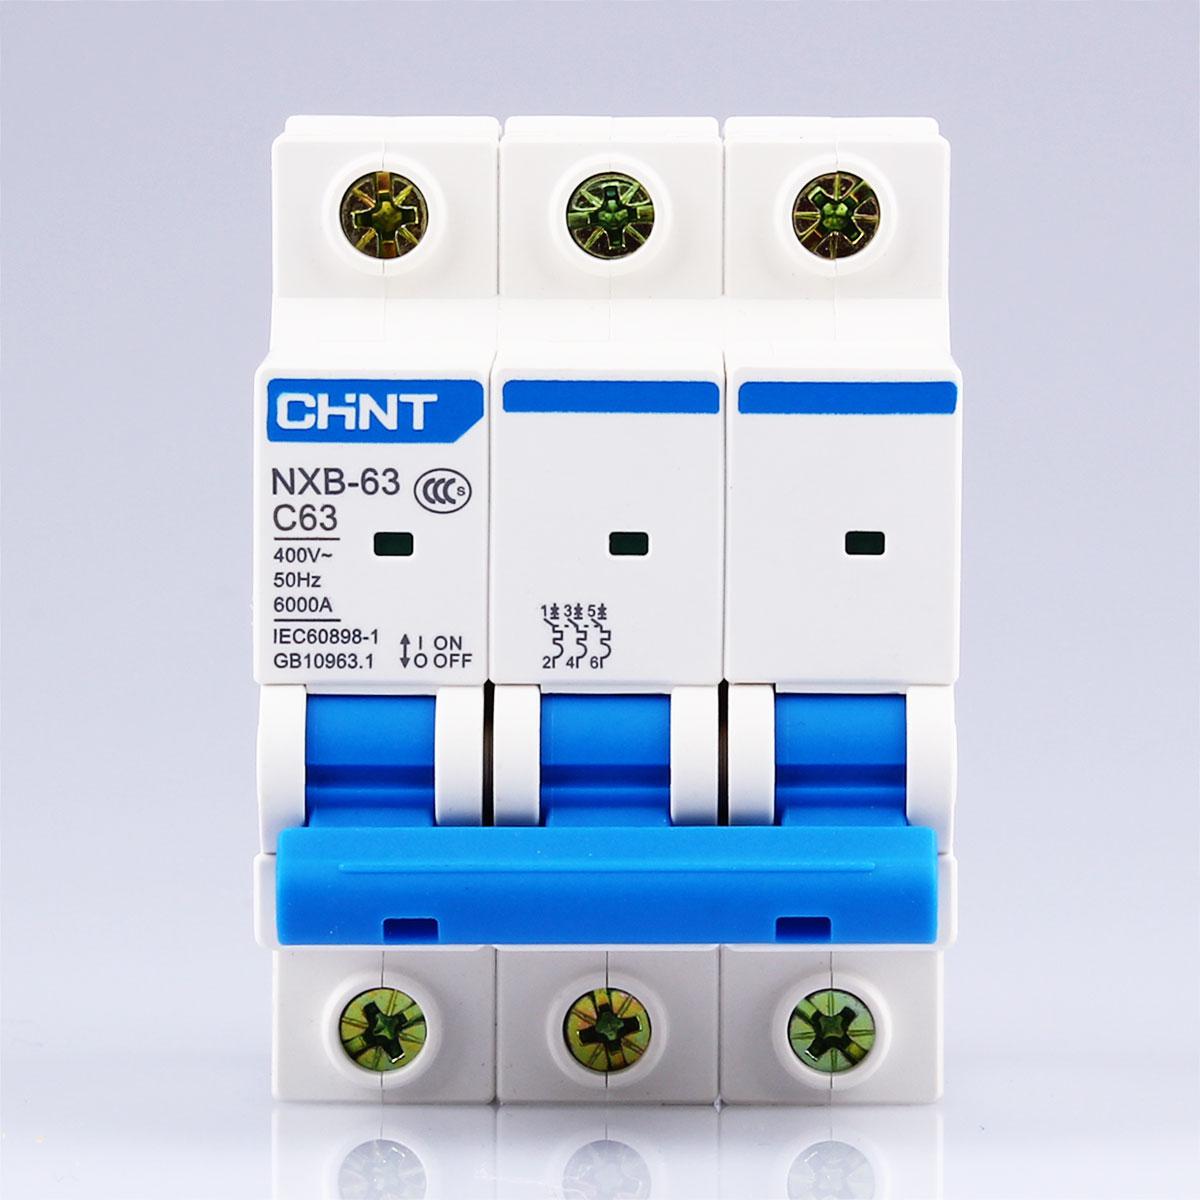 CHNT CHINT NXB-63 3P 1A 2A 3A 6A 10A 16A 20A 25A 32A 40A 63A 230V 380V Miniature Circuit breaker MCB NEW DZ47